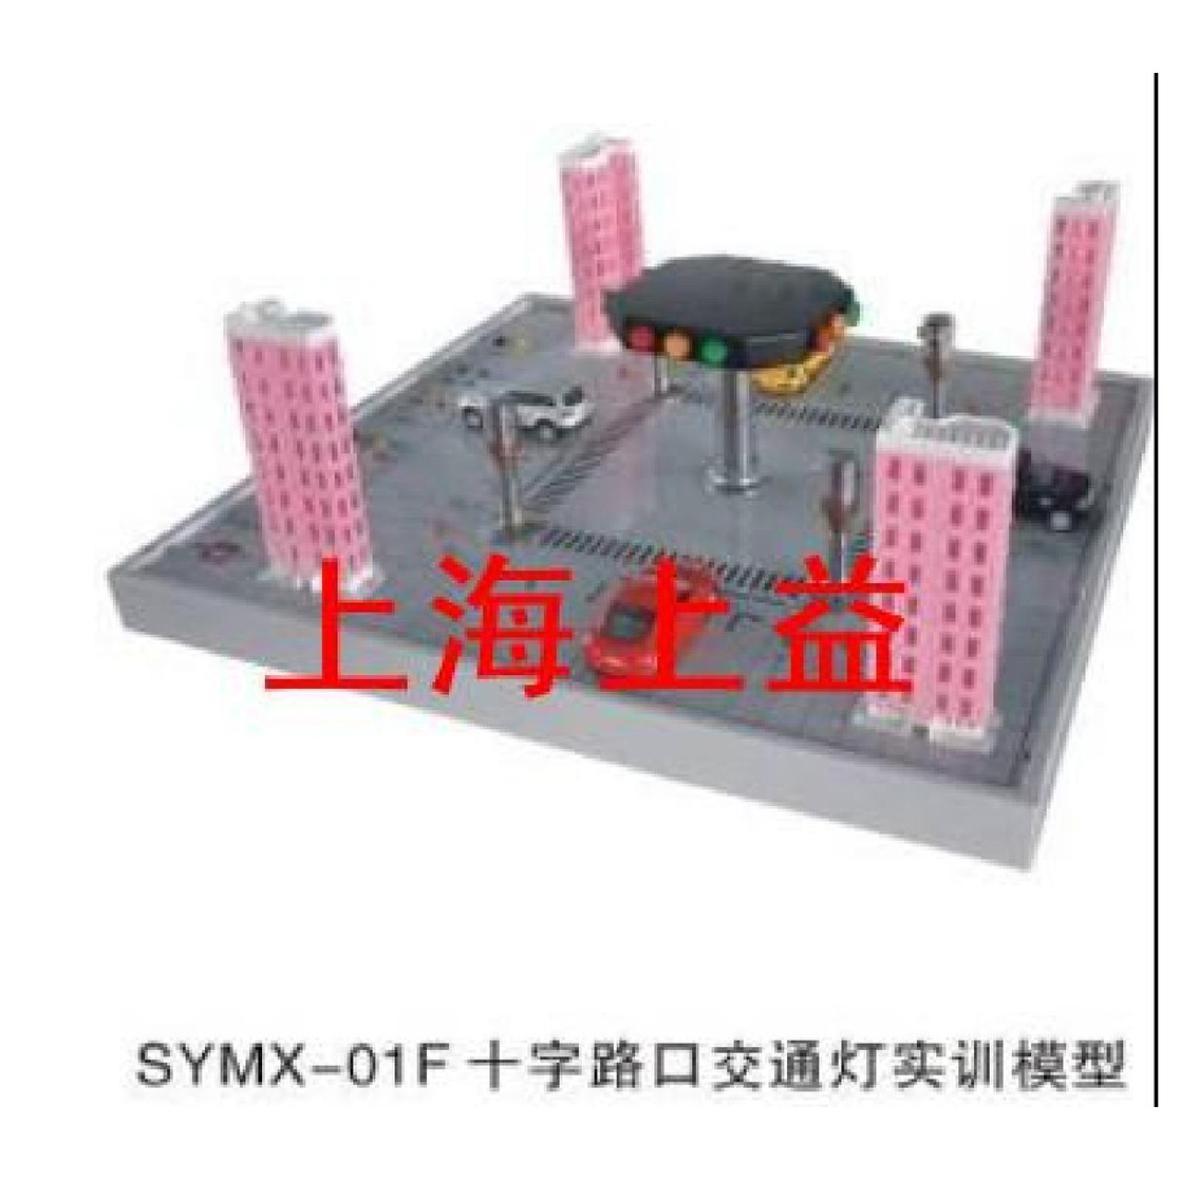 SYMX-01F十字路口交通灯实物教学实验装置